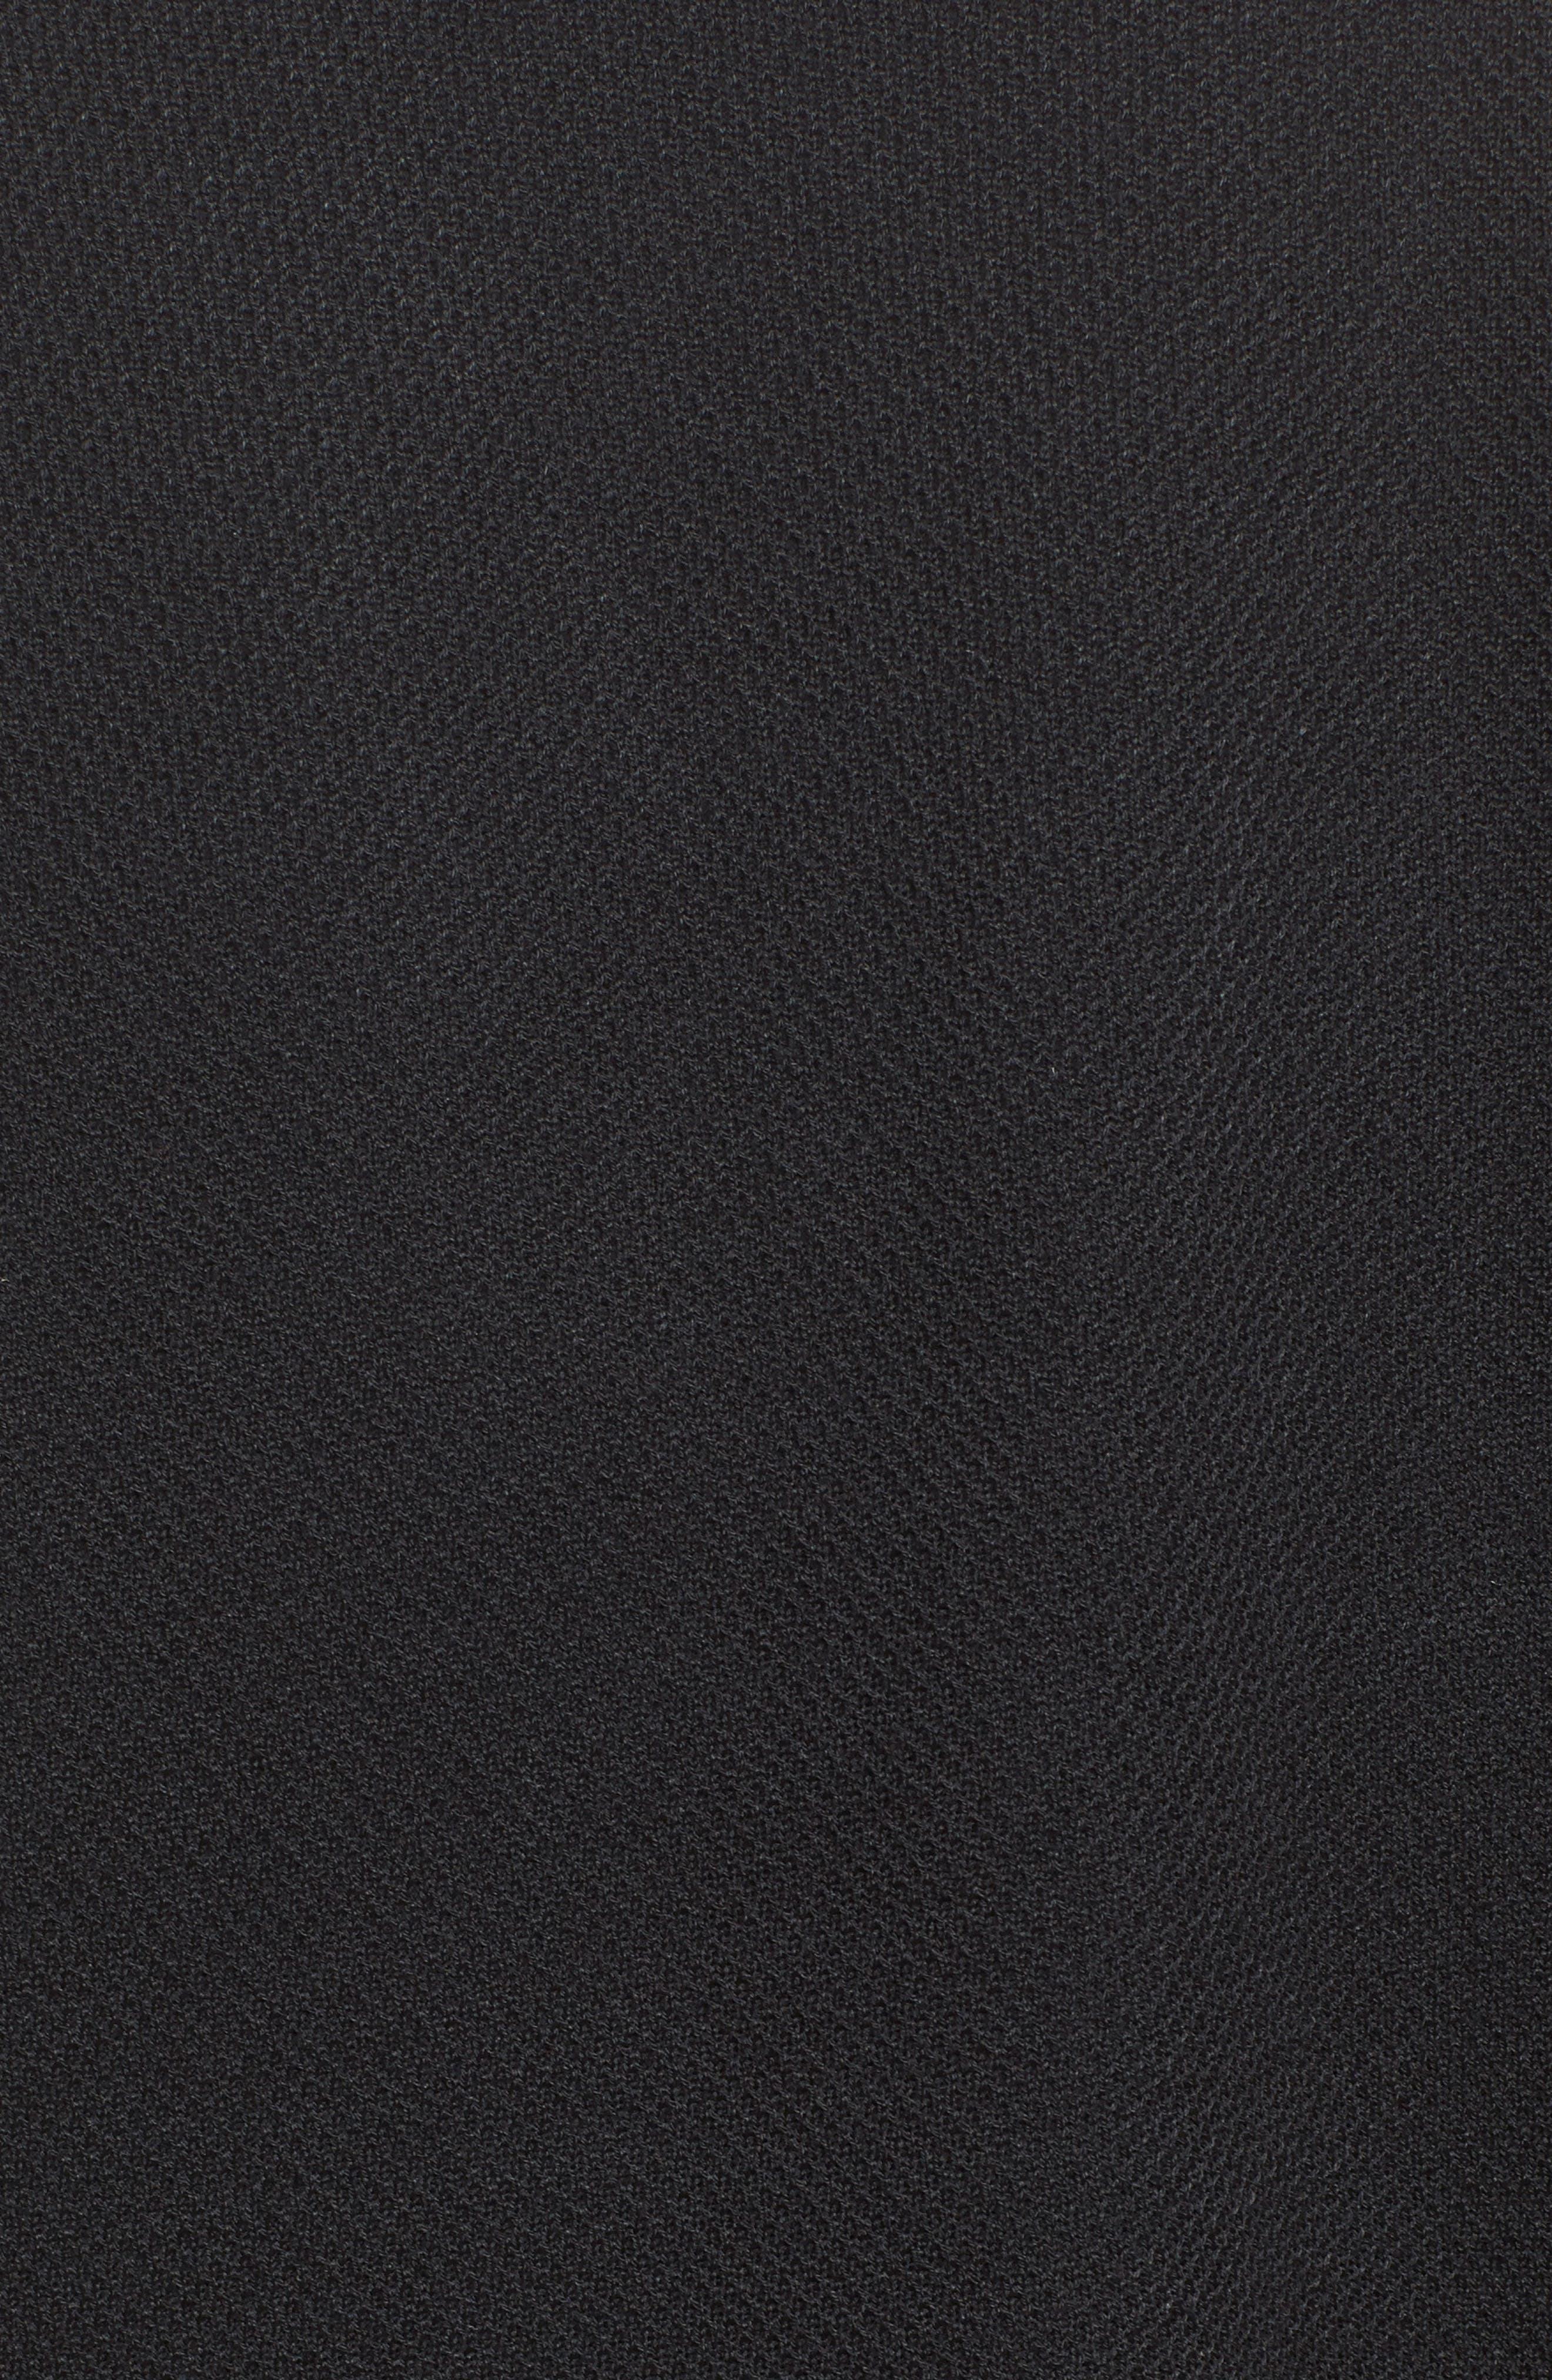 Fringe Trim Milano Piqué Knit Coat,                             Alternate thumbnail 7, color,                             CAVIAR